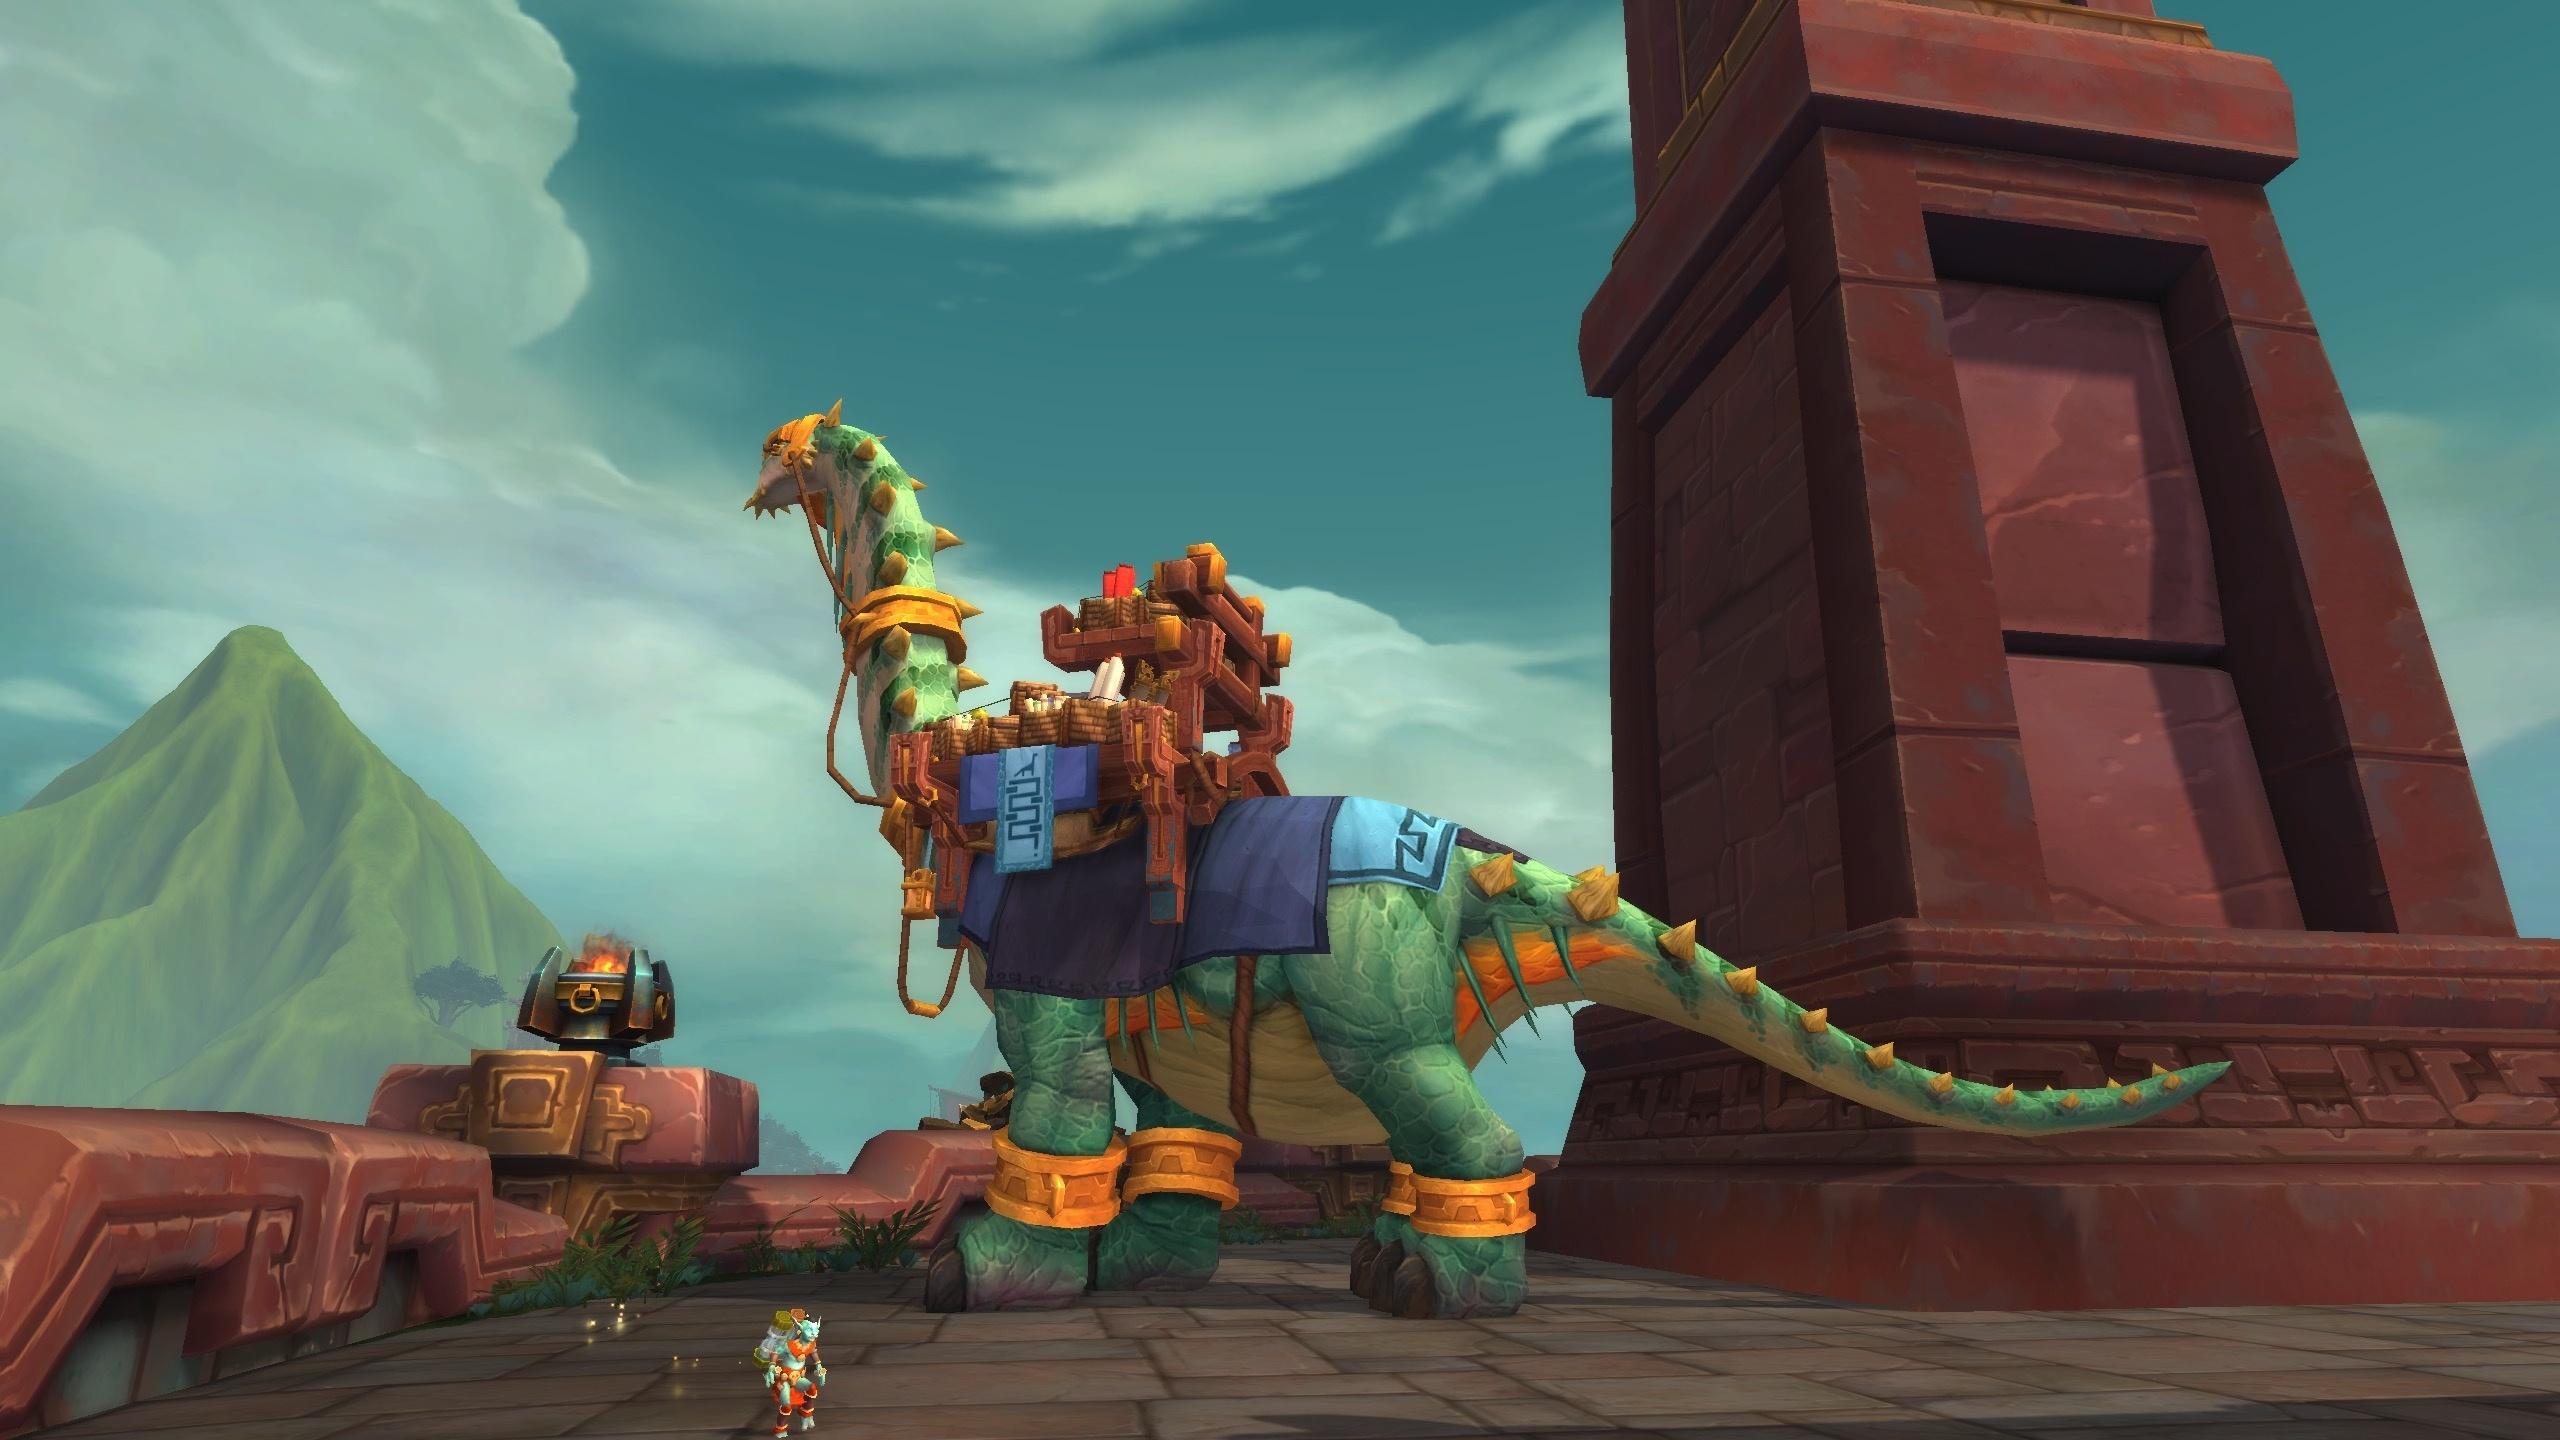 Brutosaur Dinosaur Mount - Battle for Azeroth Model Preview